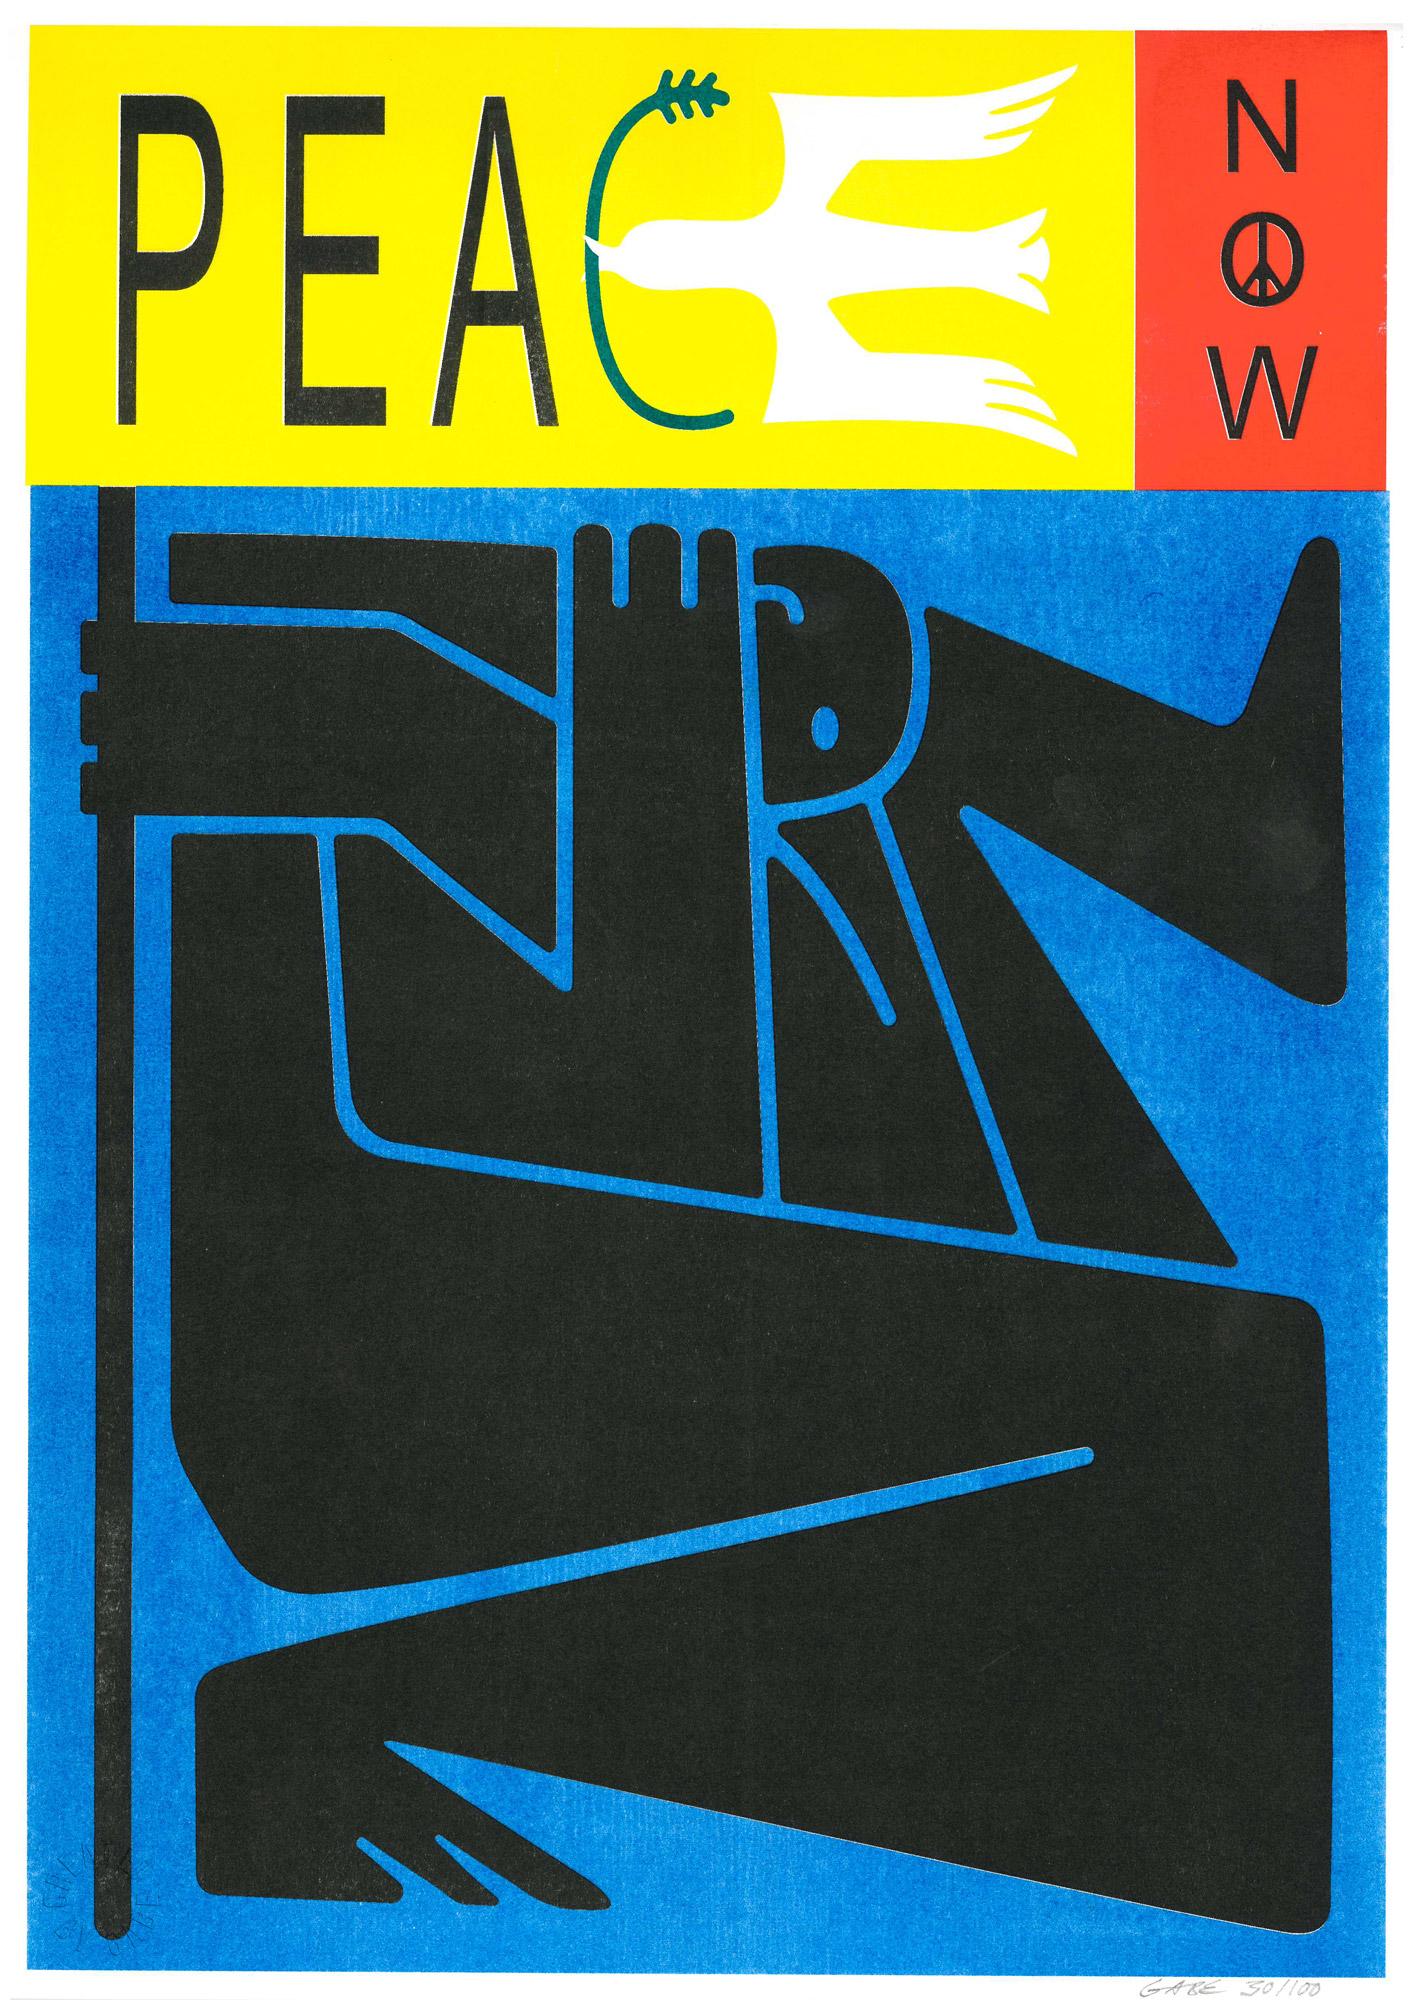 Gabe_Riso_Peace